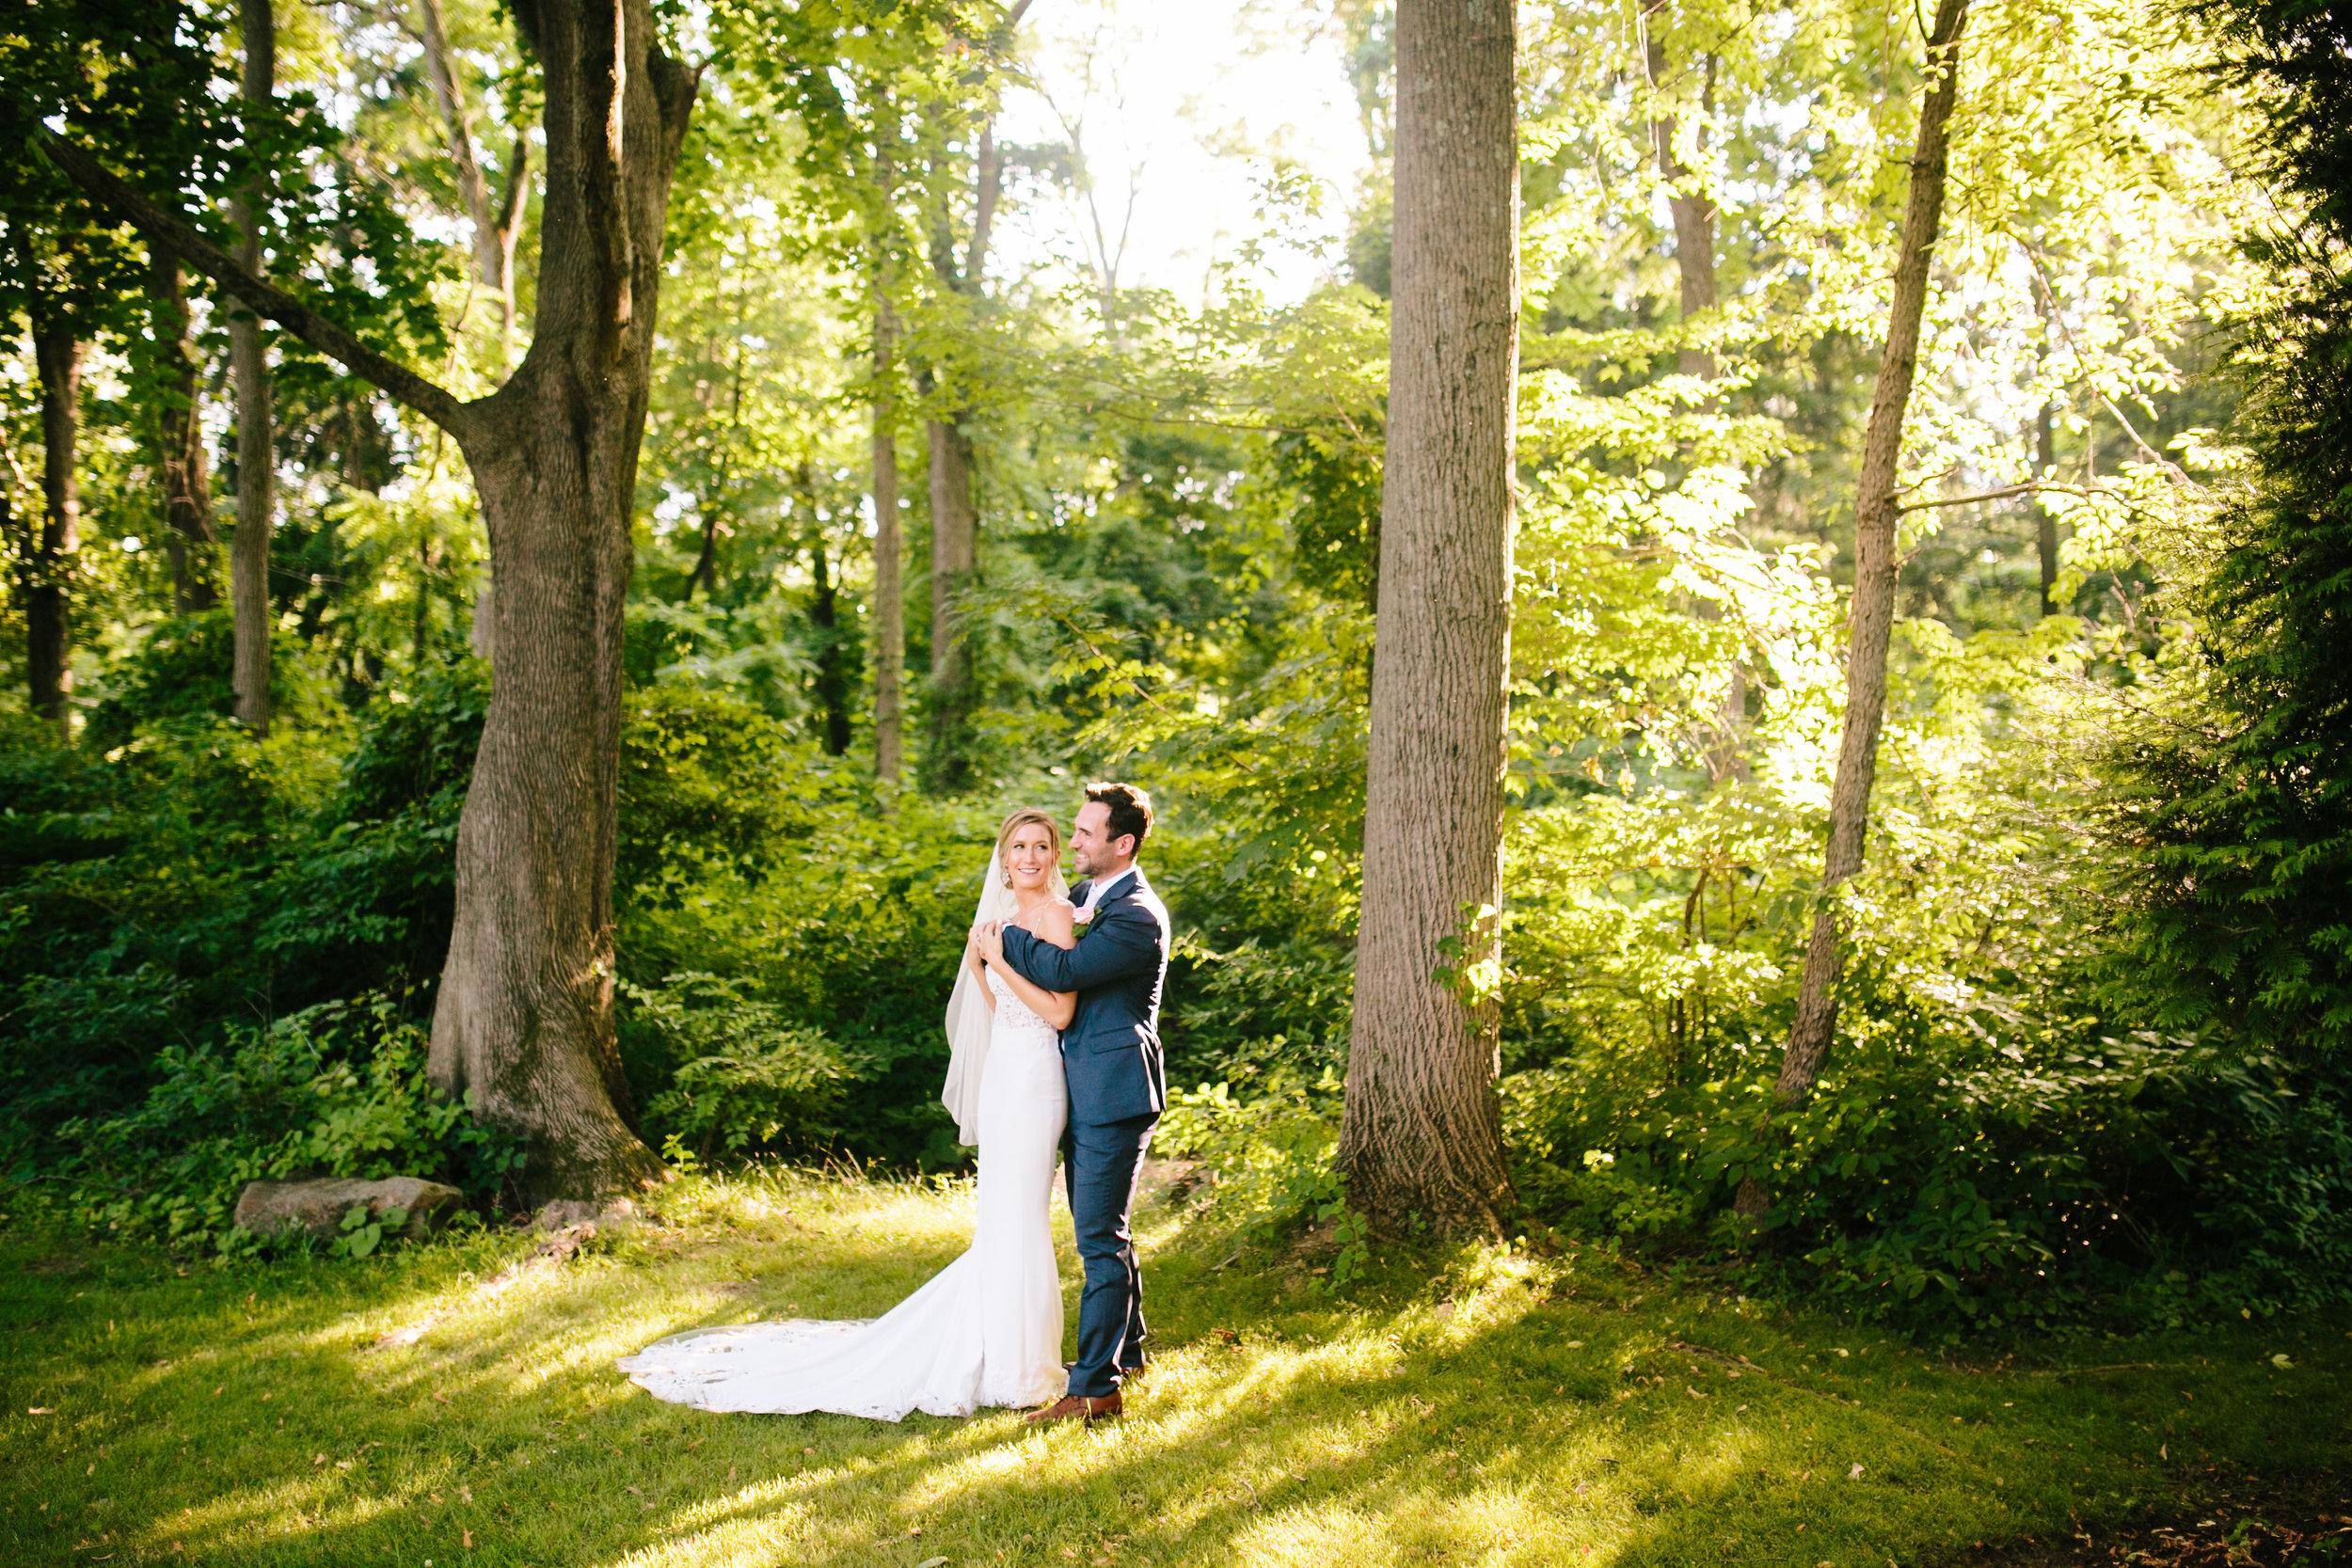 amyjamie_anthonywaynehouse_wedding_image-929.jpg